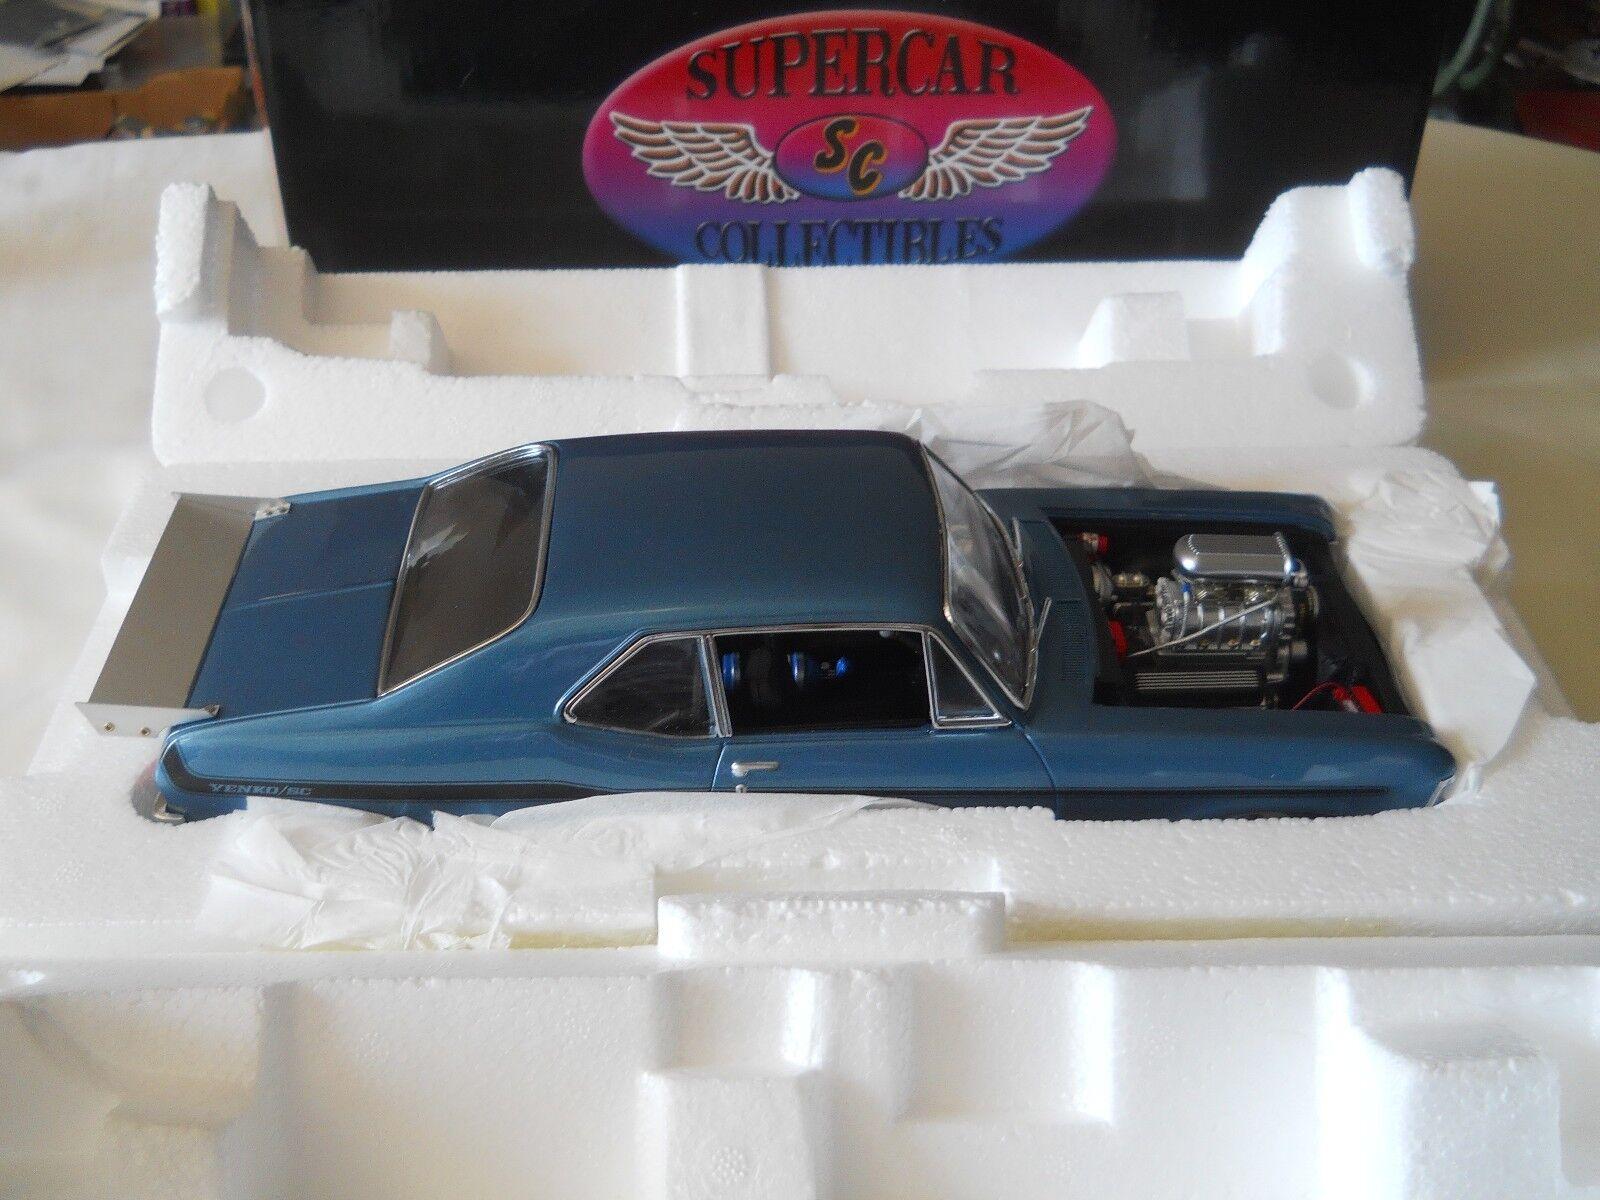 Gmp supersportwagen collectibles 1969 chevy nova 1 420 teil 18809 1,18 druckguss w - box